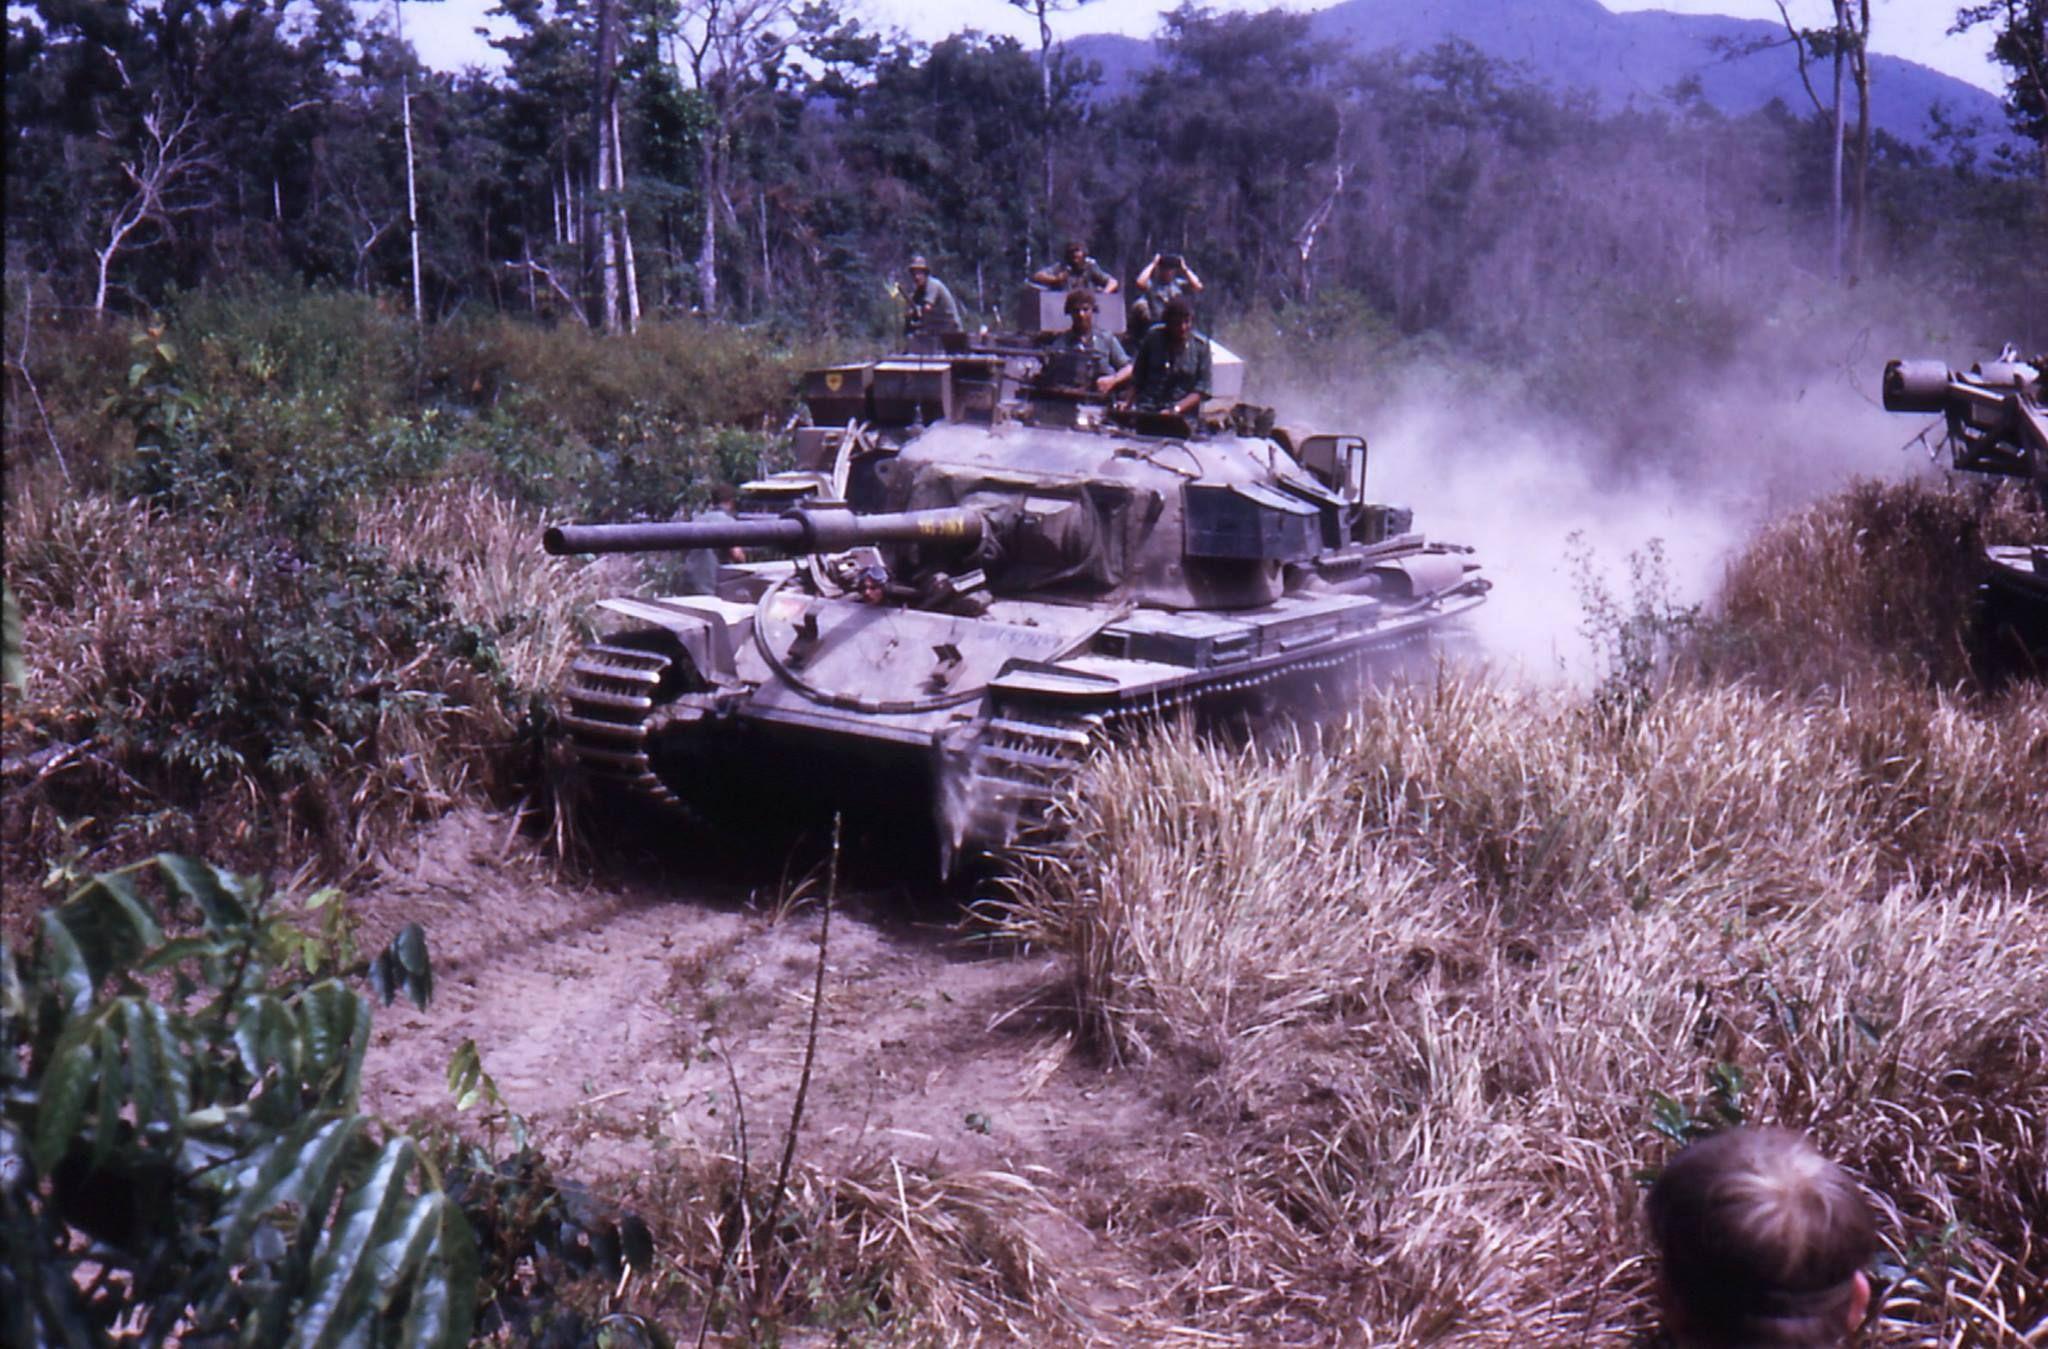 Centurion, Tank, Armored fighting vehicle